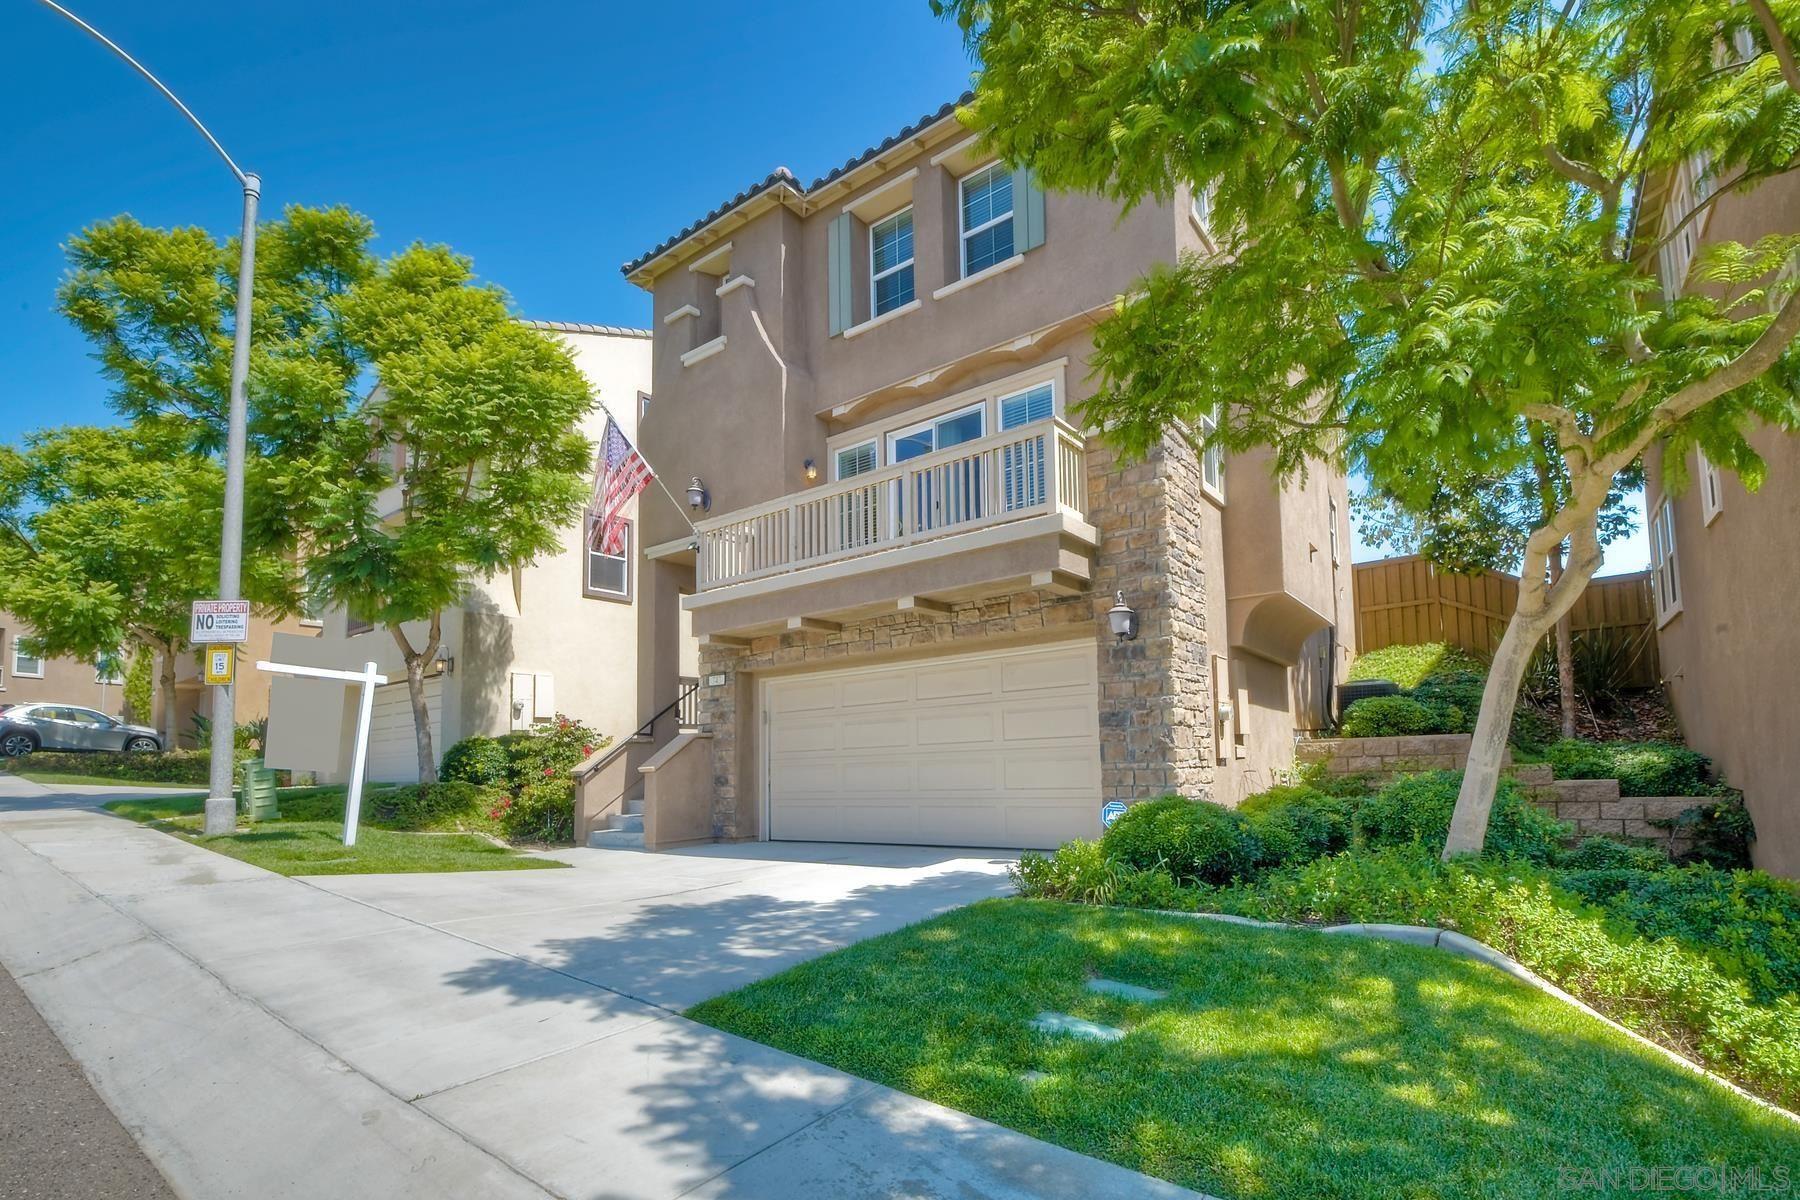 Photo of 343 Steelhead Way, Vista, CA 92083 (MLS # 210025011)